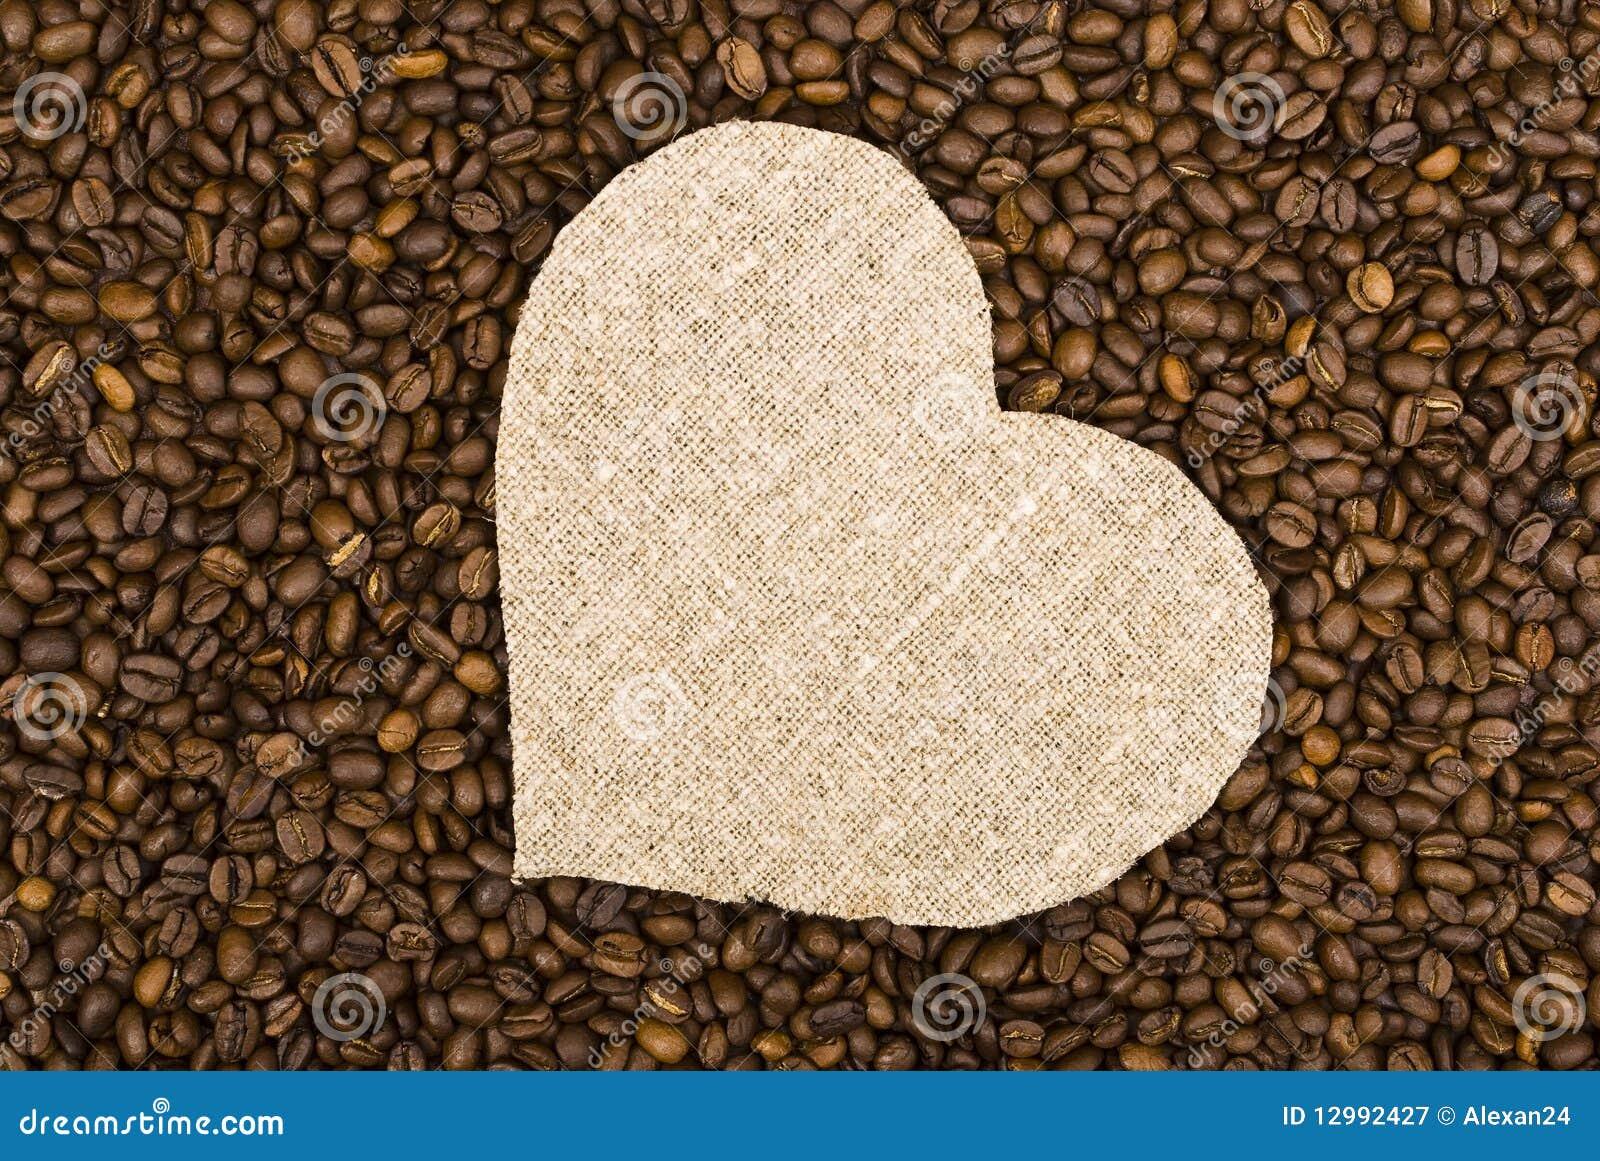 Sackcloth heart on coffee beans